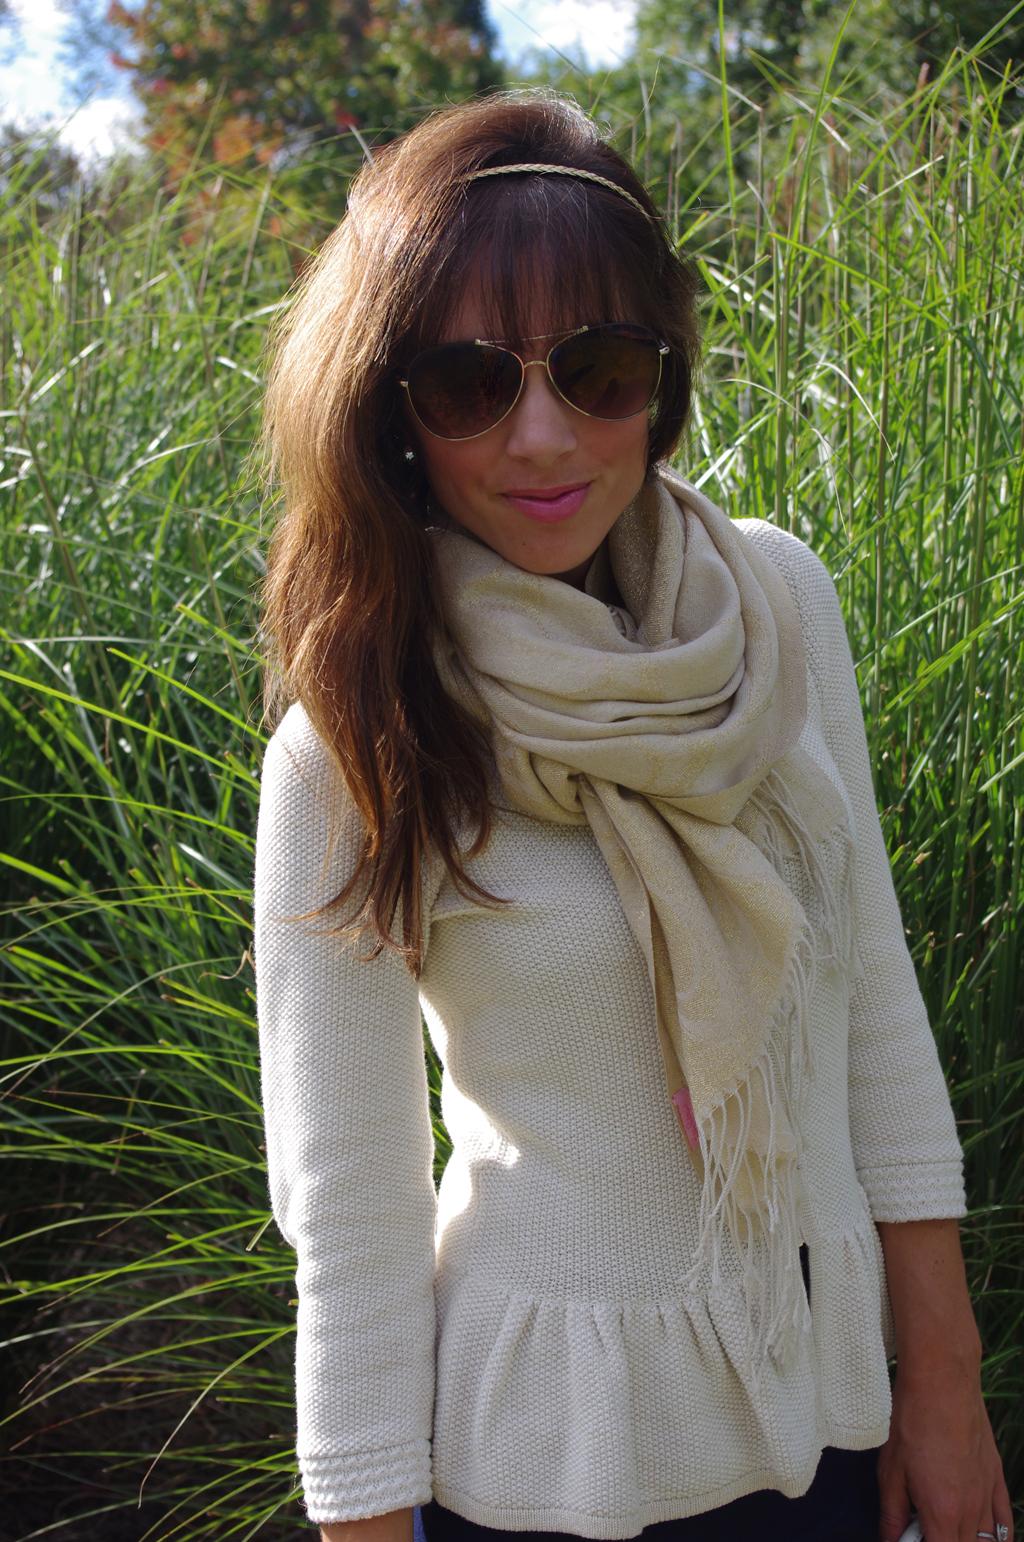 sweaterwglasses